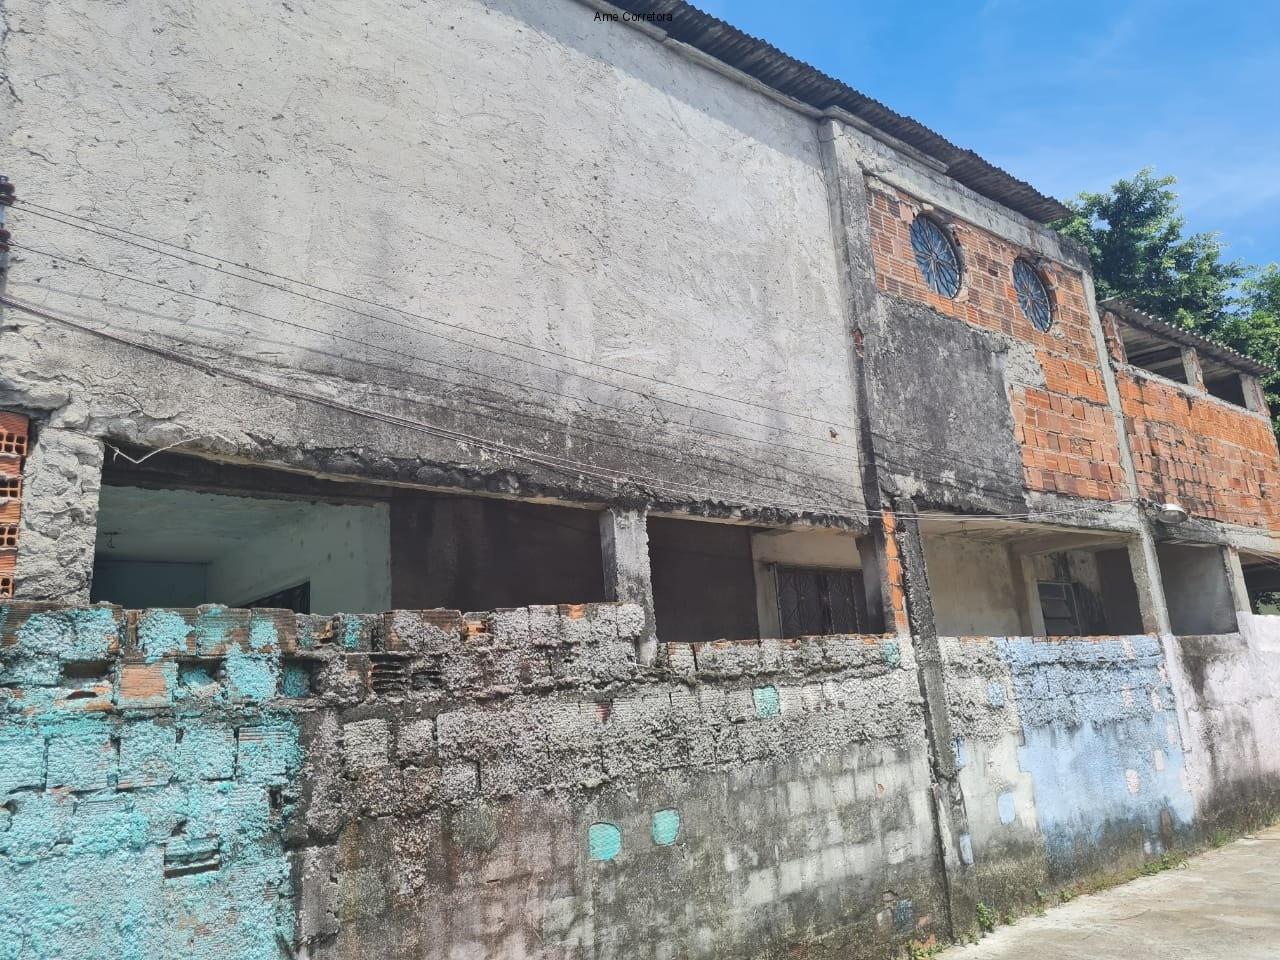 FOTO 05 - Terreno à venda Bangu, Rio de Janeiro - R$ 1.300.000 - TE00066 - 7